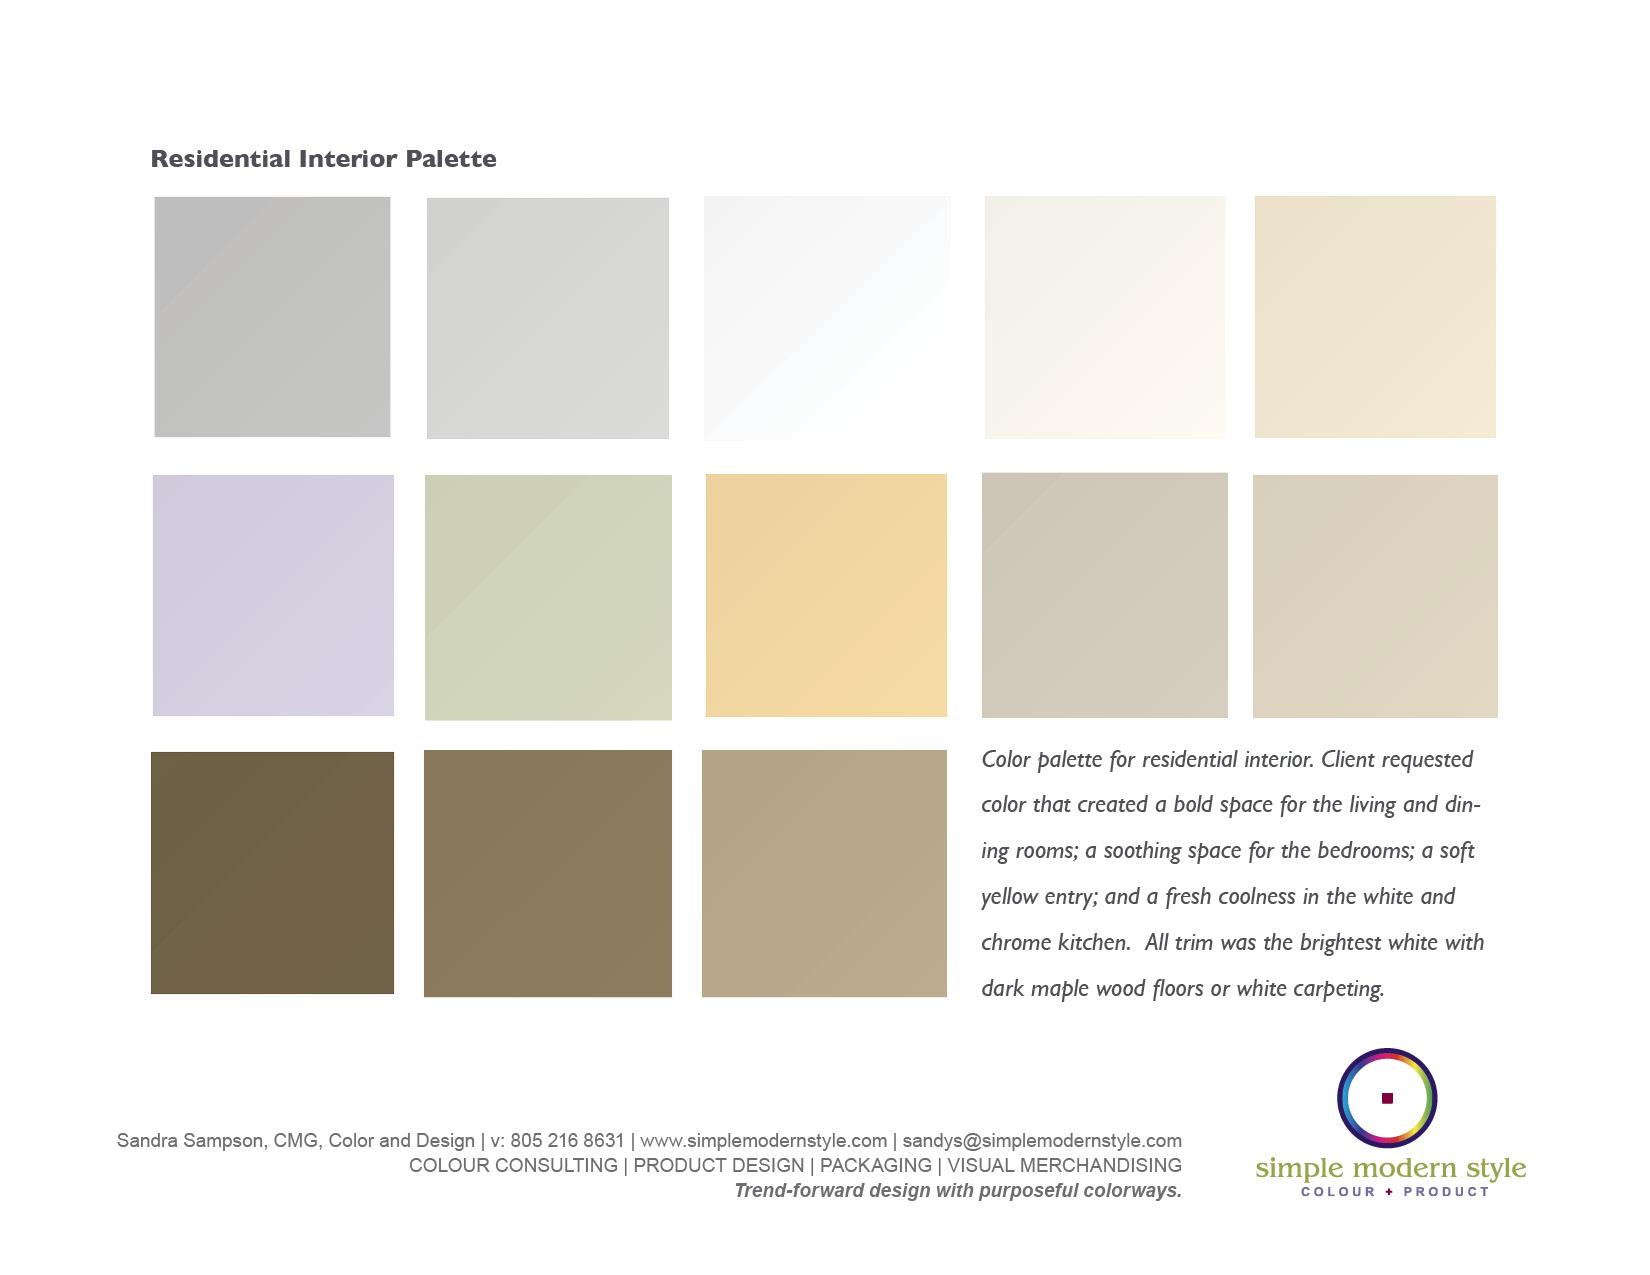 SMS_Interior_Home_Colors_Case_Study2.jpg